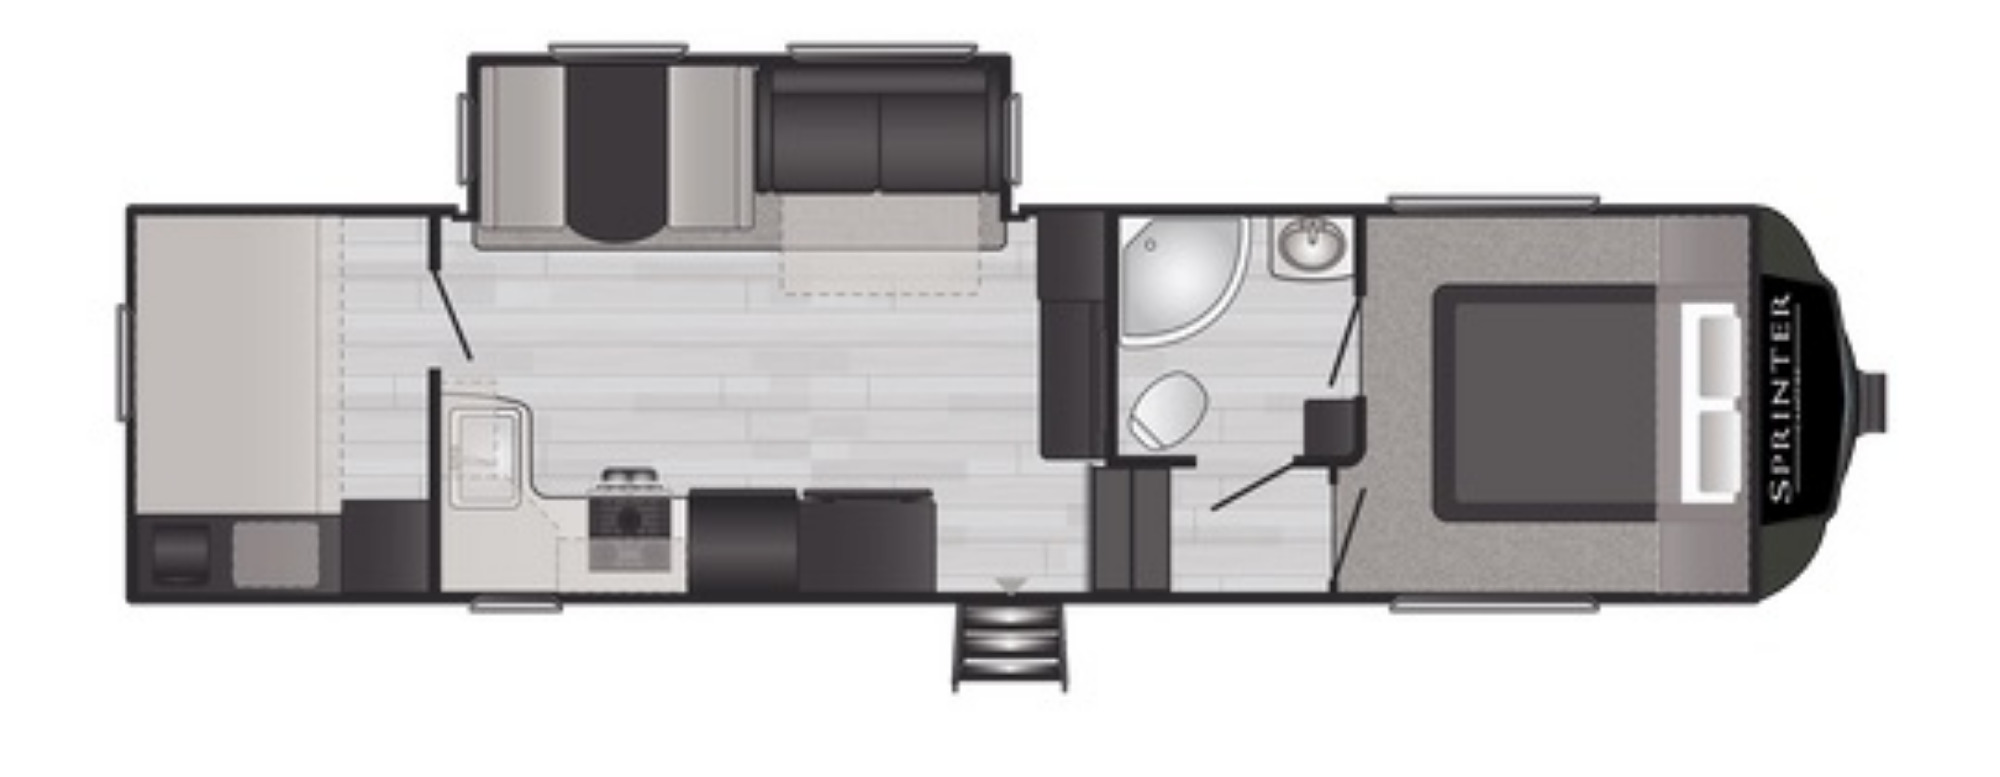 View Floor Plan for 2021 KEYSTONE SPRINTER F29BH